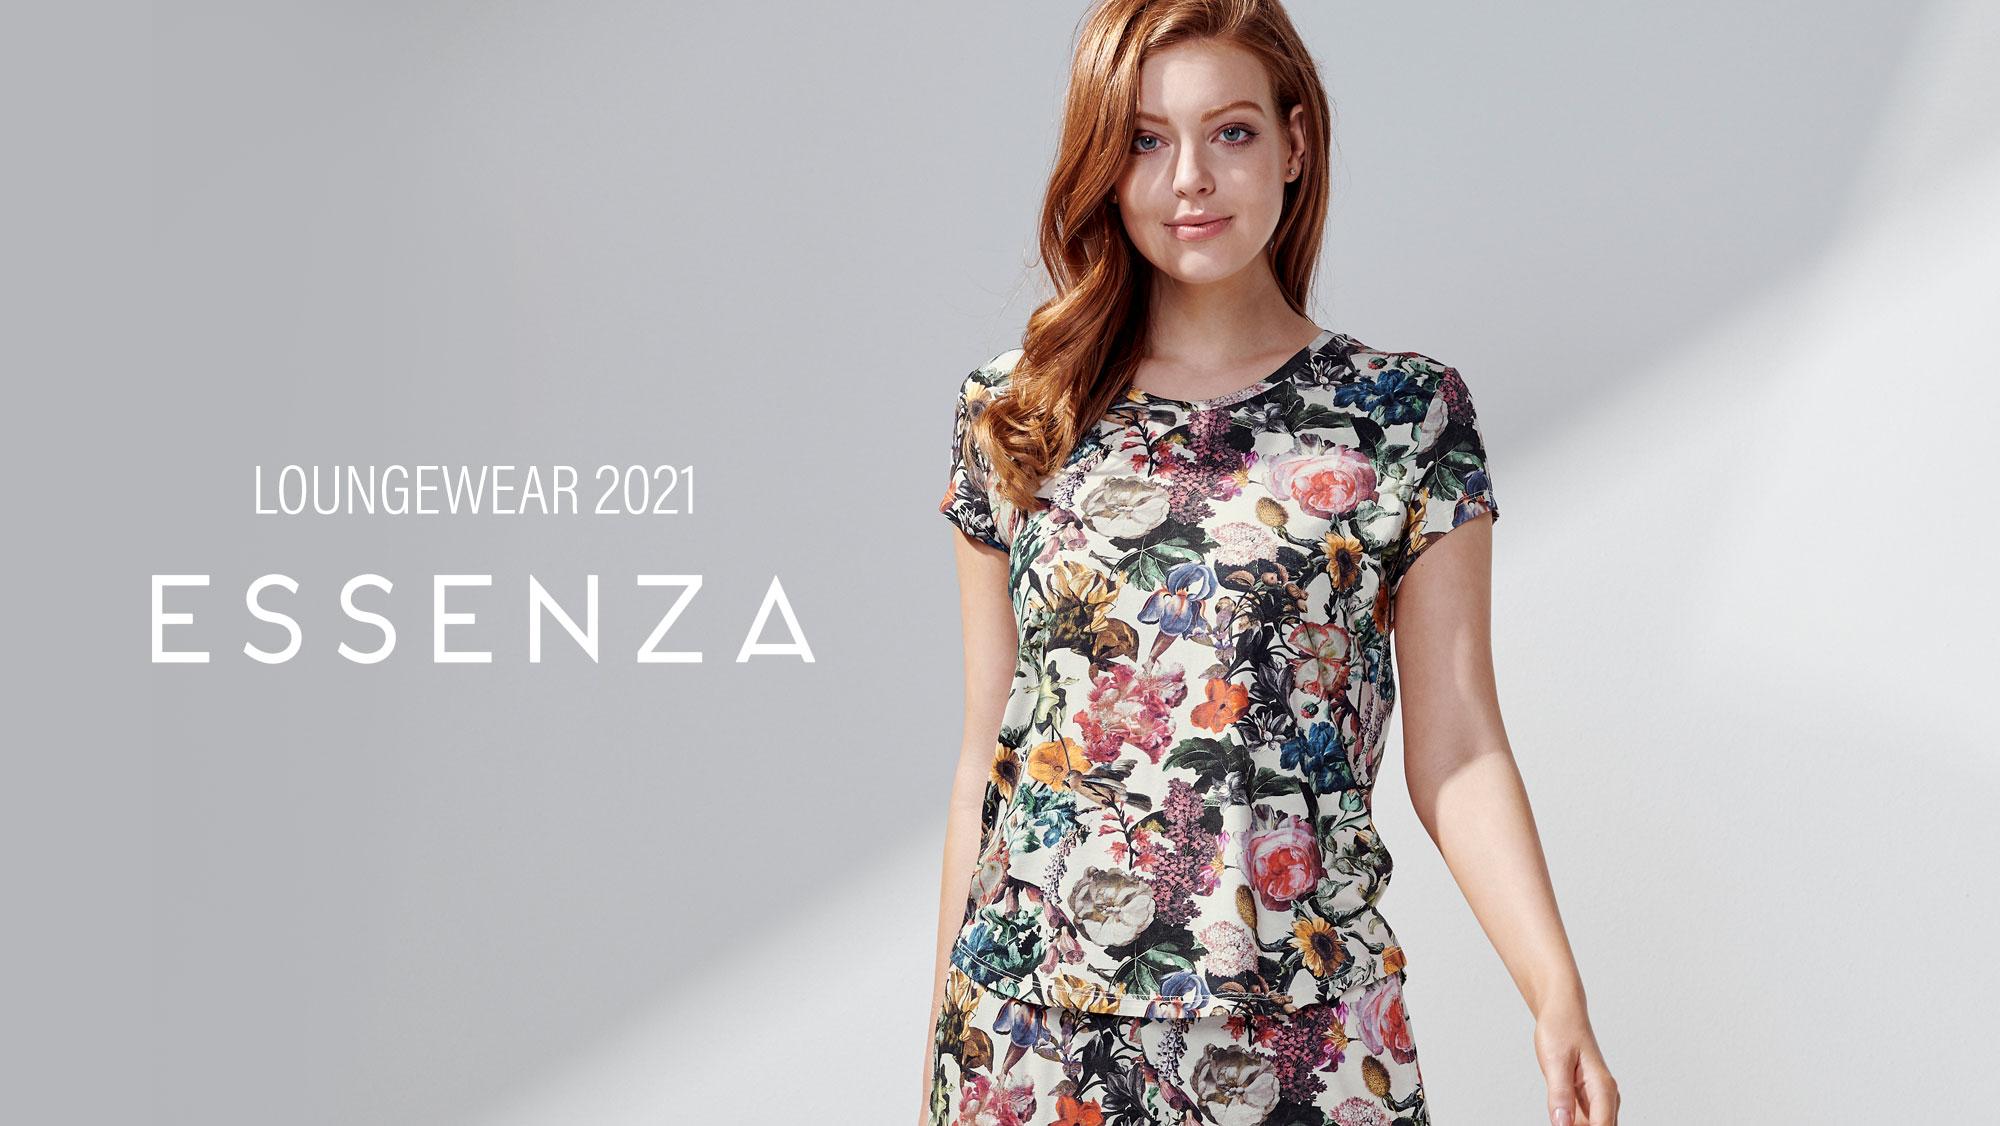 Essenza Loungewear 2021